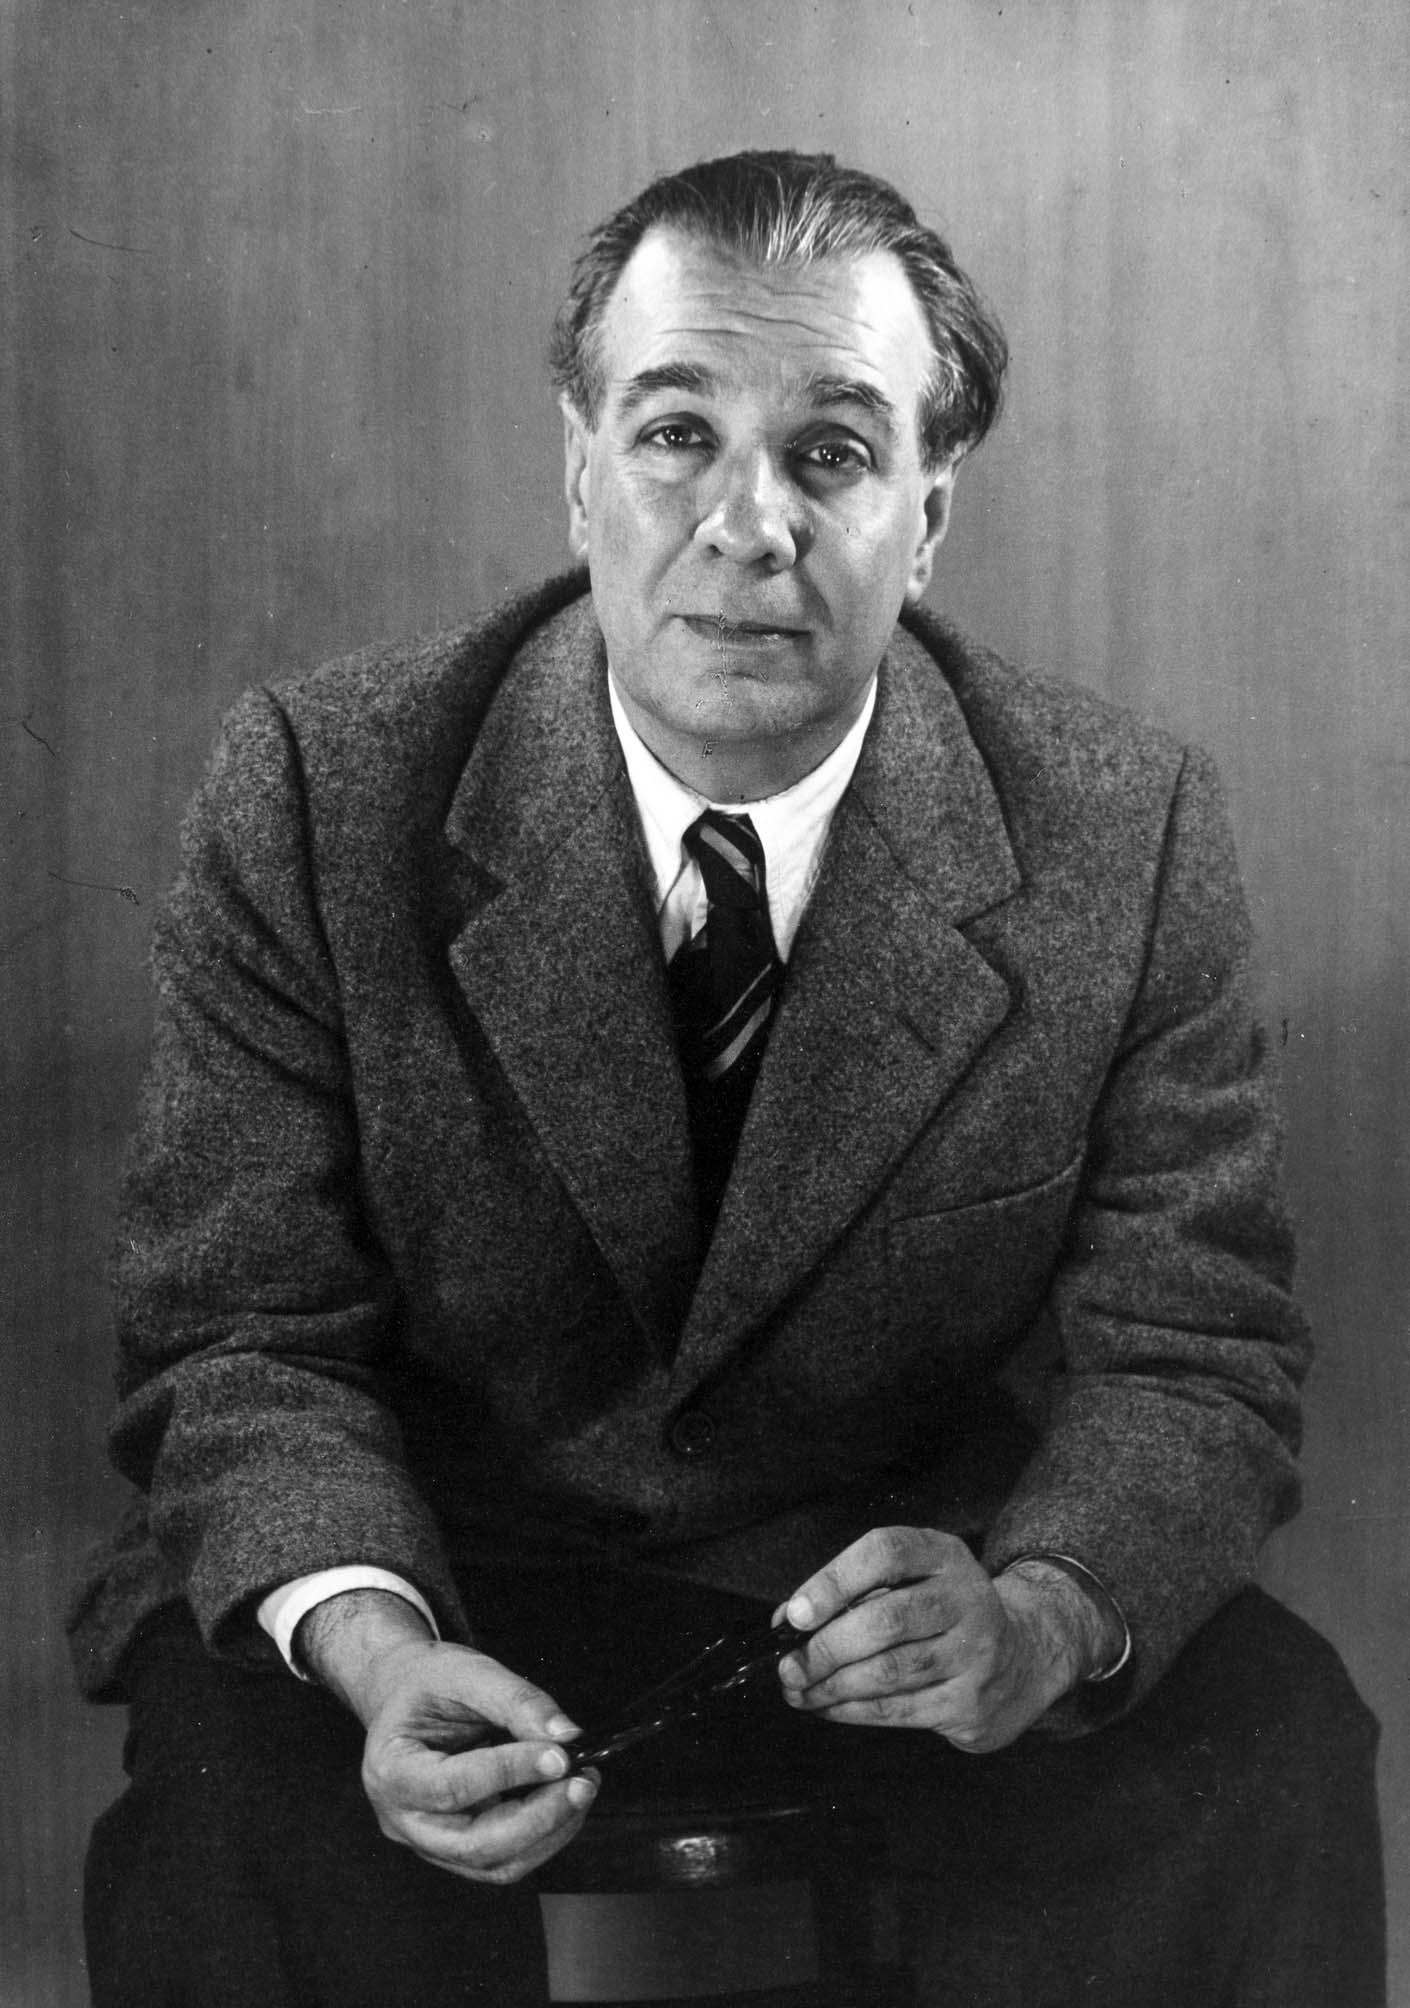 File:Jorge Luis Borges 1951, by Grete Stern.jpg